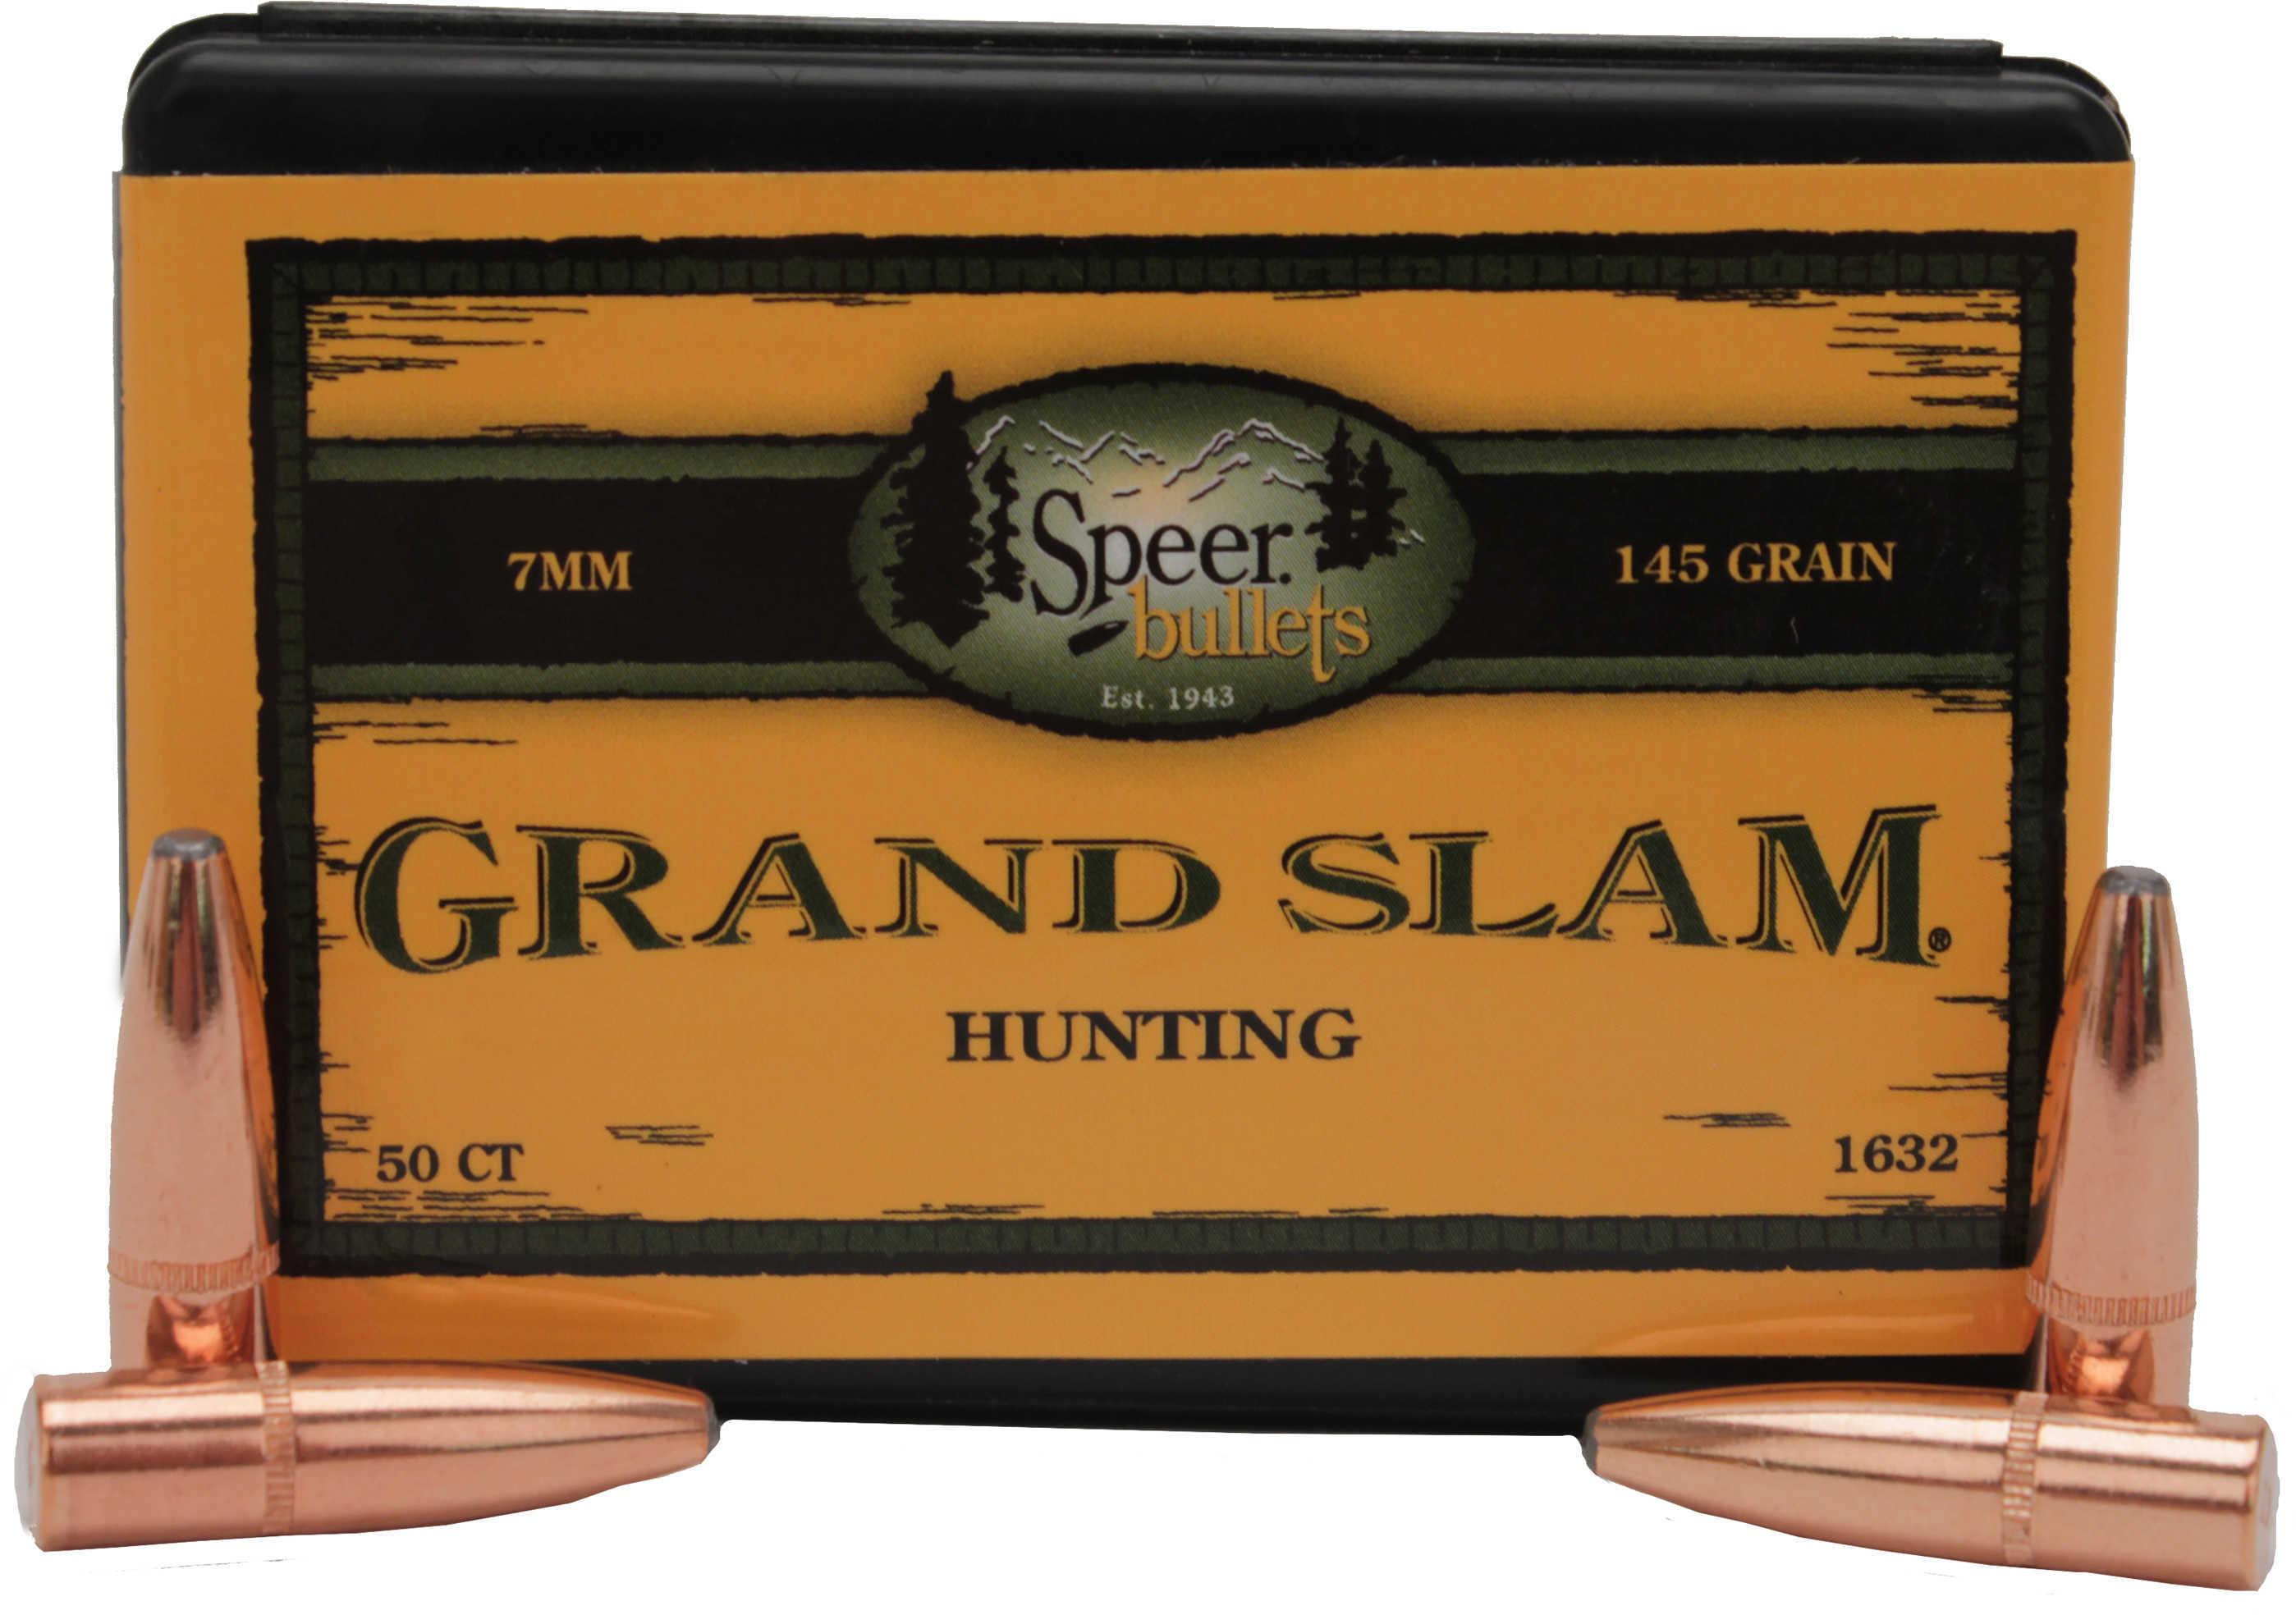 Speer 7mm 145 Grains SP Grand Slam Per 50 Md: 1632 Bullets